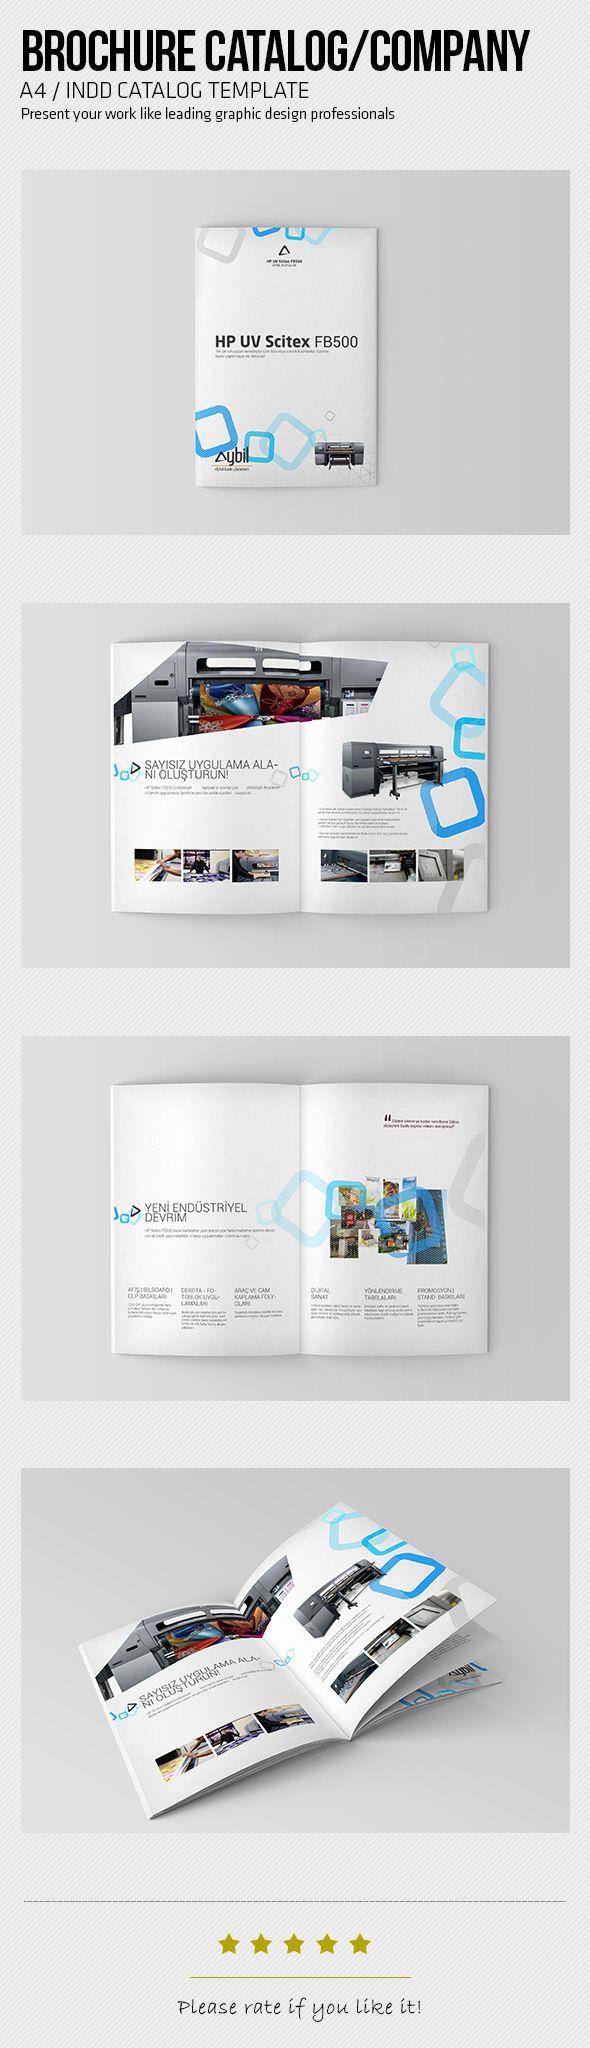 advertisement brochure, annual report, annual report brochure, blue, blue brochure, brochure design, business, business brochure, catalog brochure, clean brochure, company profile, corporate, corporate brochure, creative brochure, modern brochure, multipurpose, Multipurpose Brochure, professional brochure, simple brochure